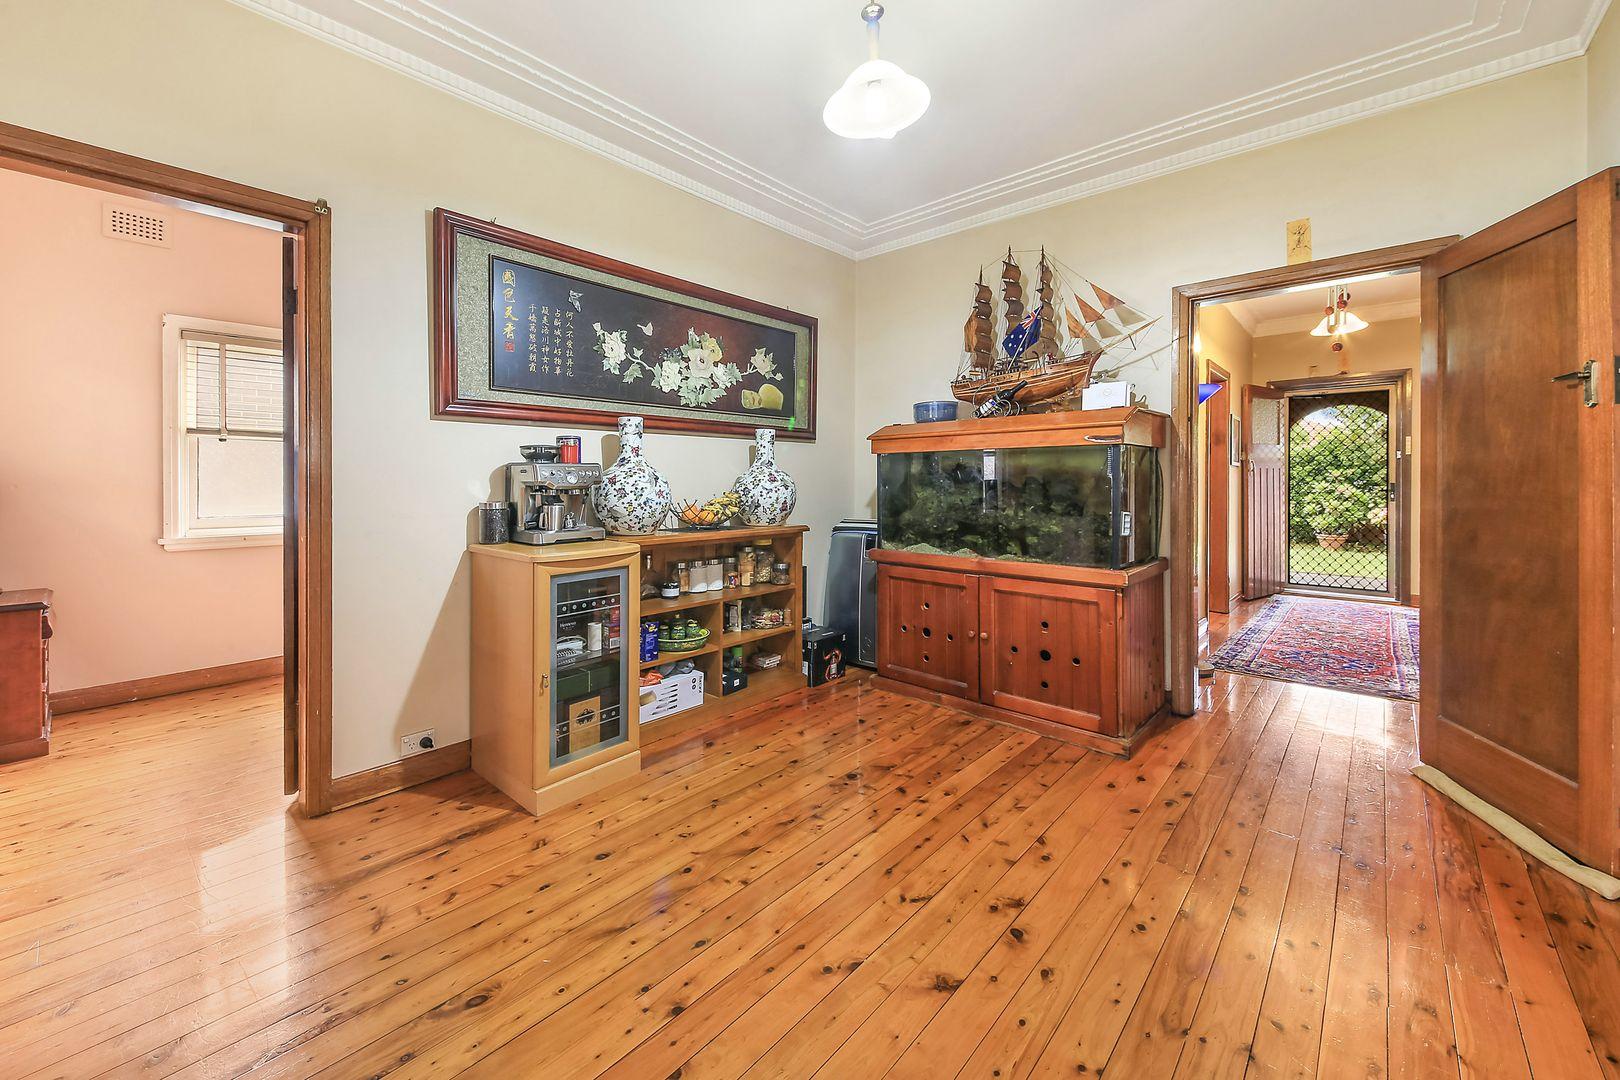 121 BARDWELL RD, Bardwell Park NSW 2207, Image 1